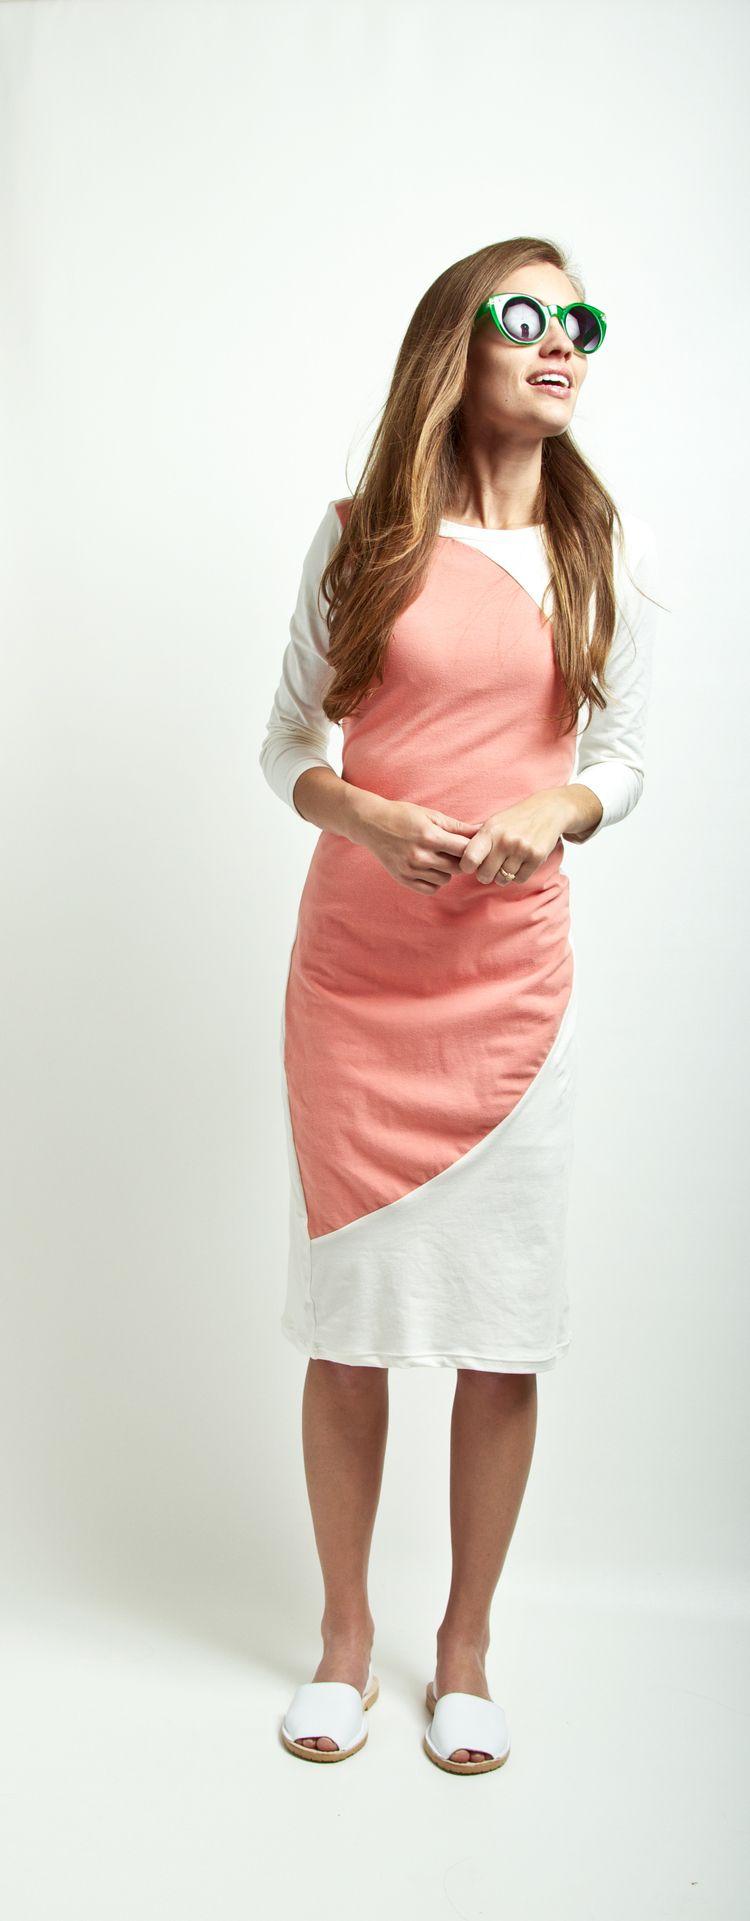 Below the knee length summer dresses